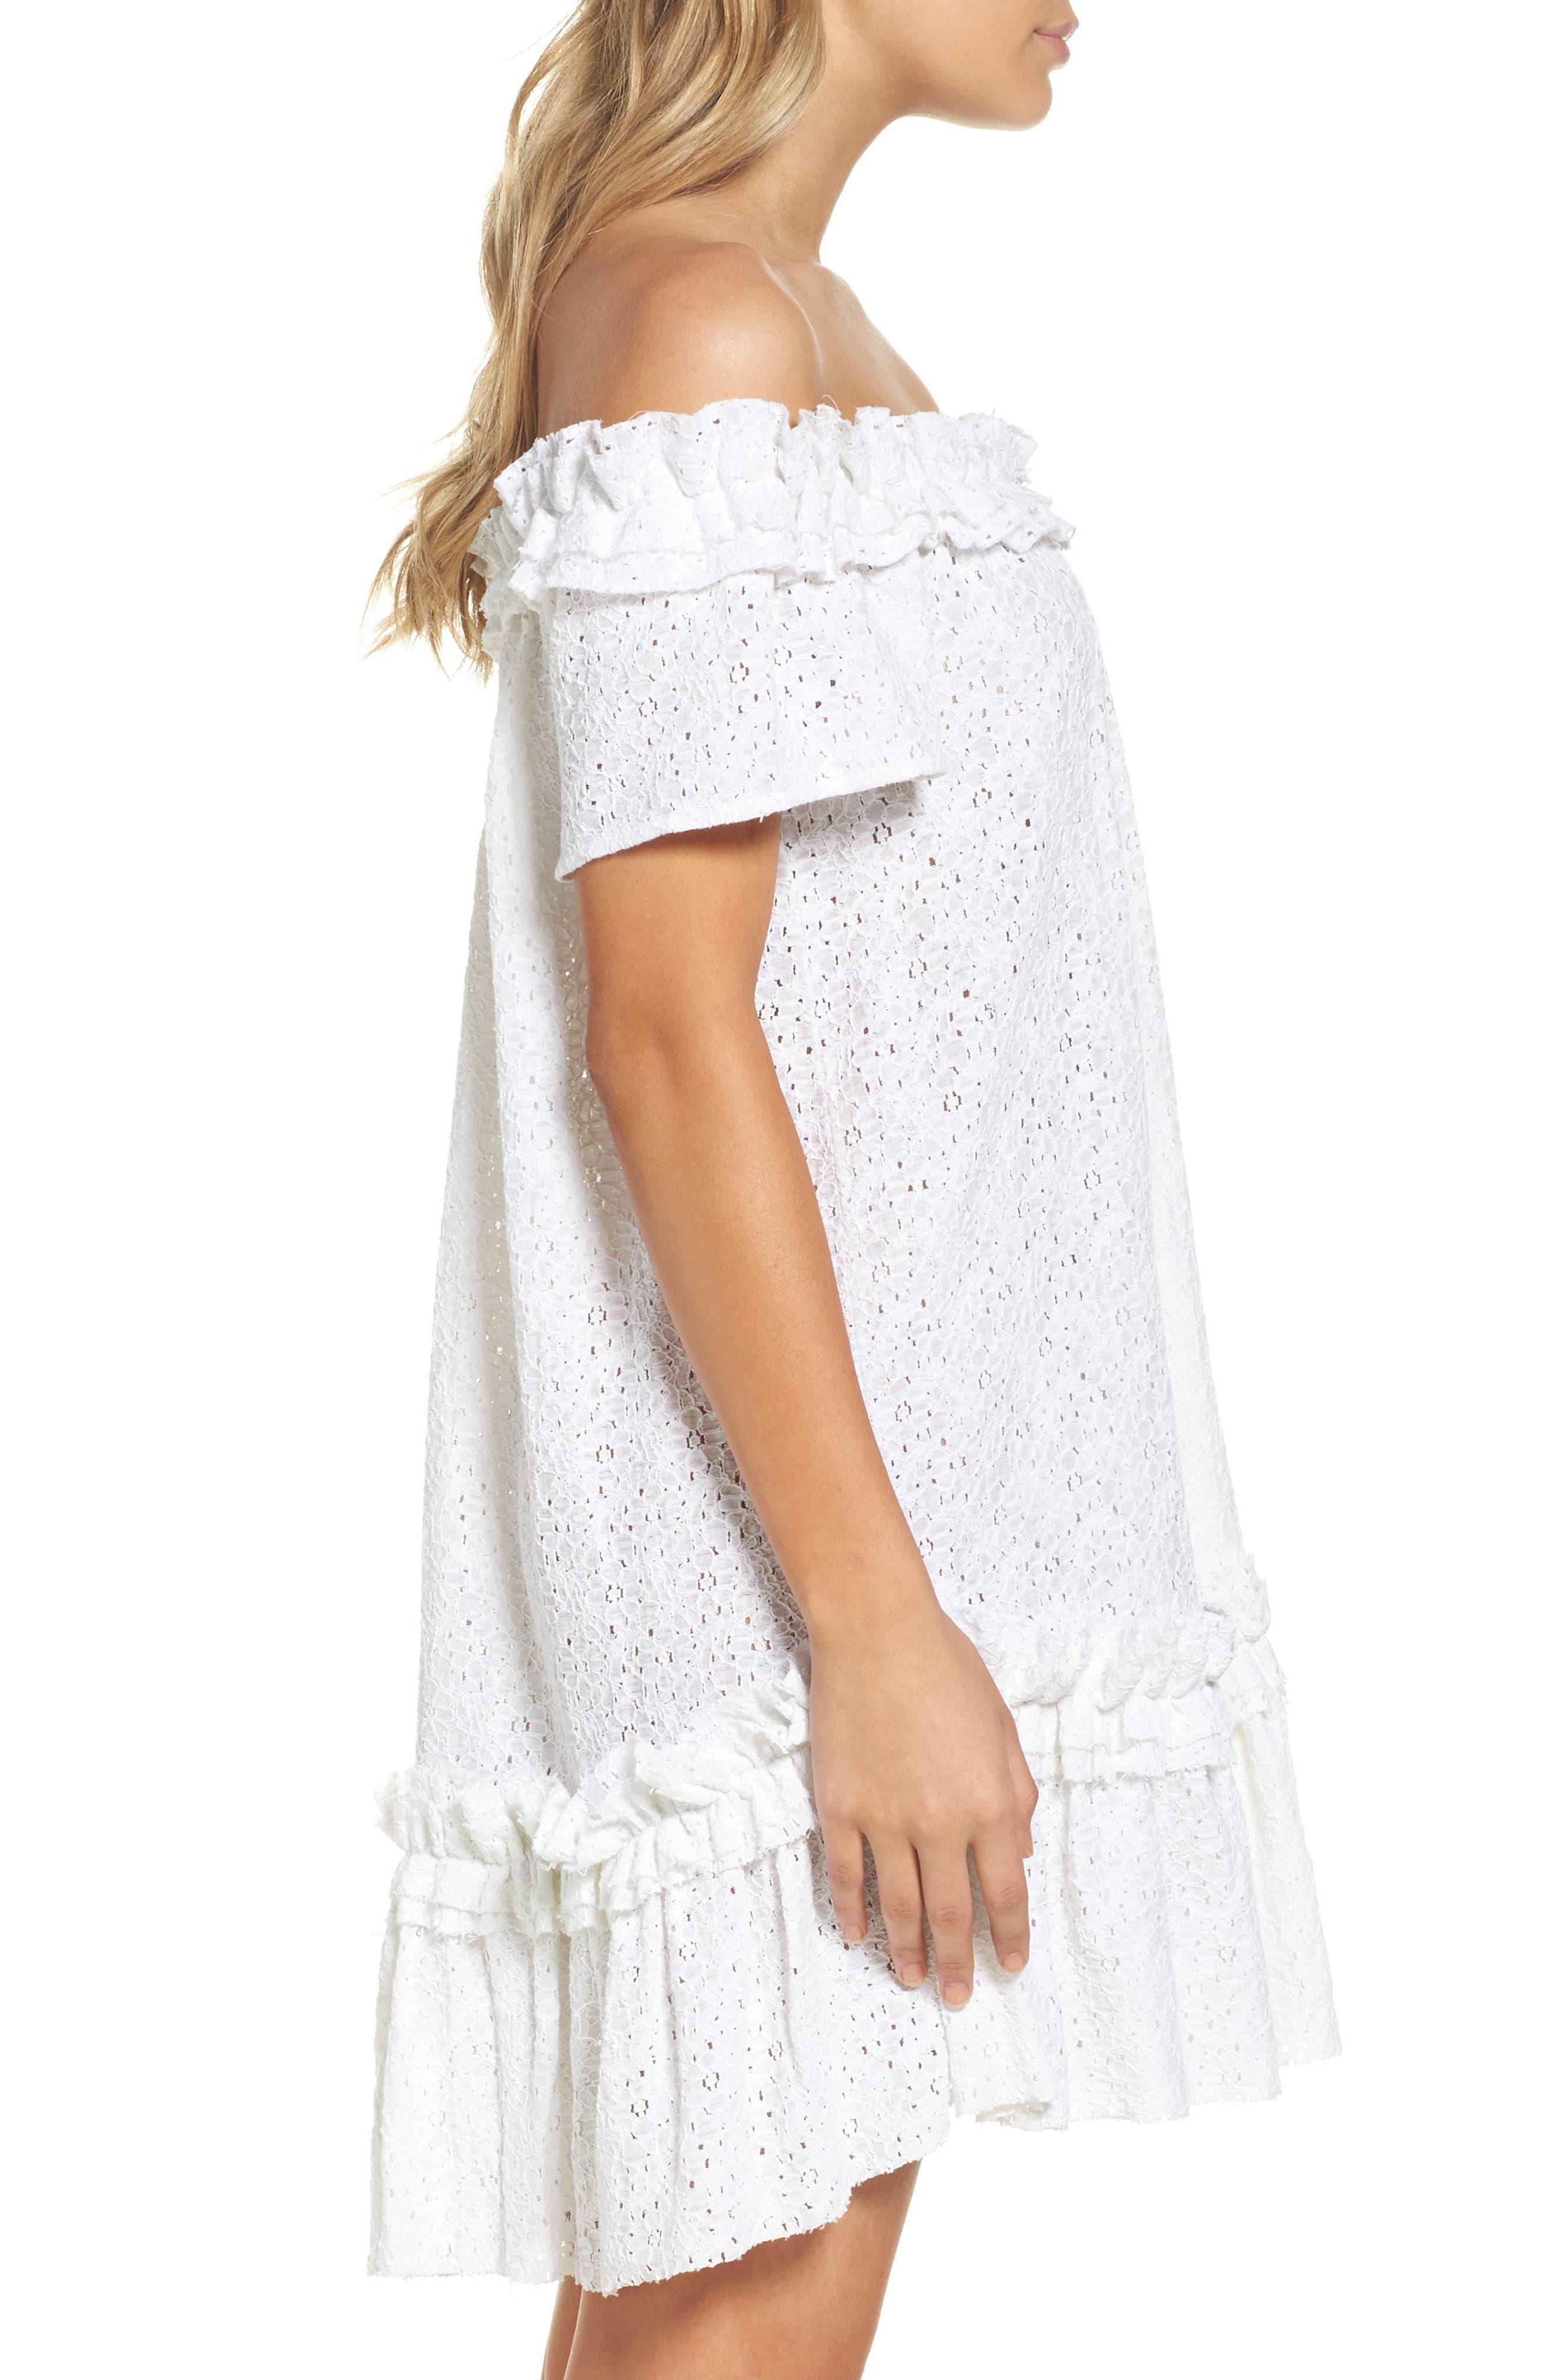 Mojito Cover-Up Dress,                             Alternate thumbnail 3, color,                             White